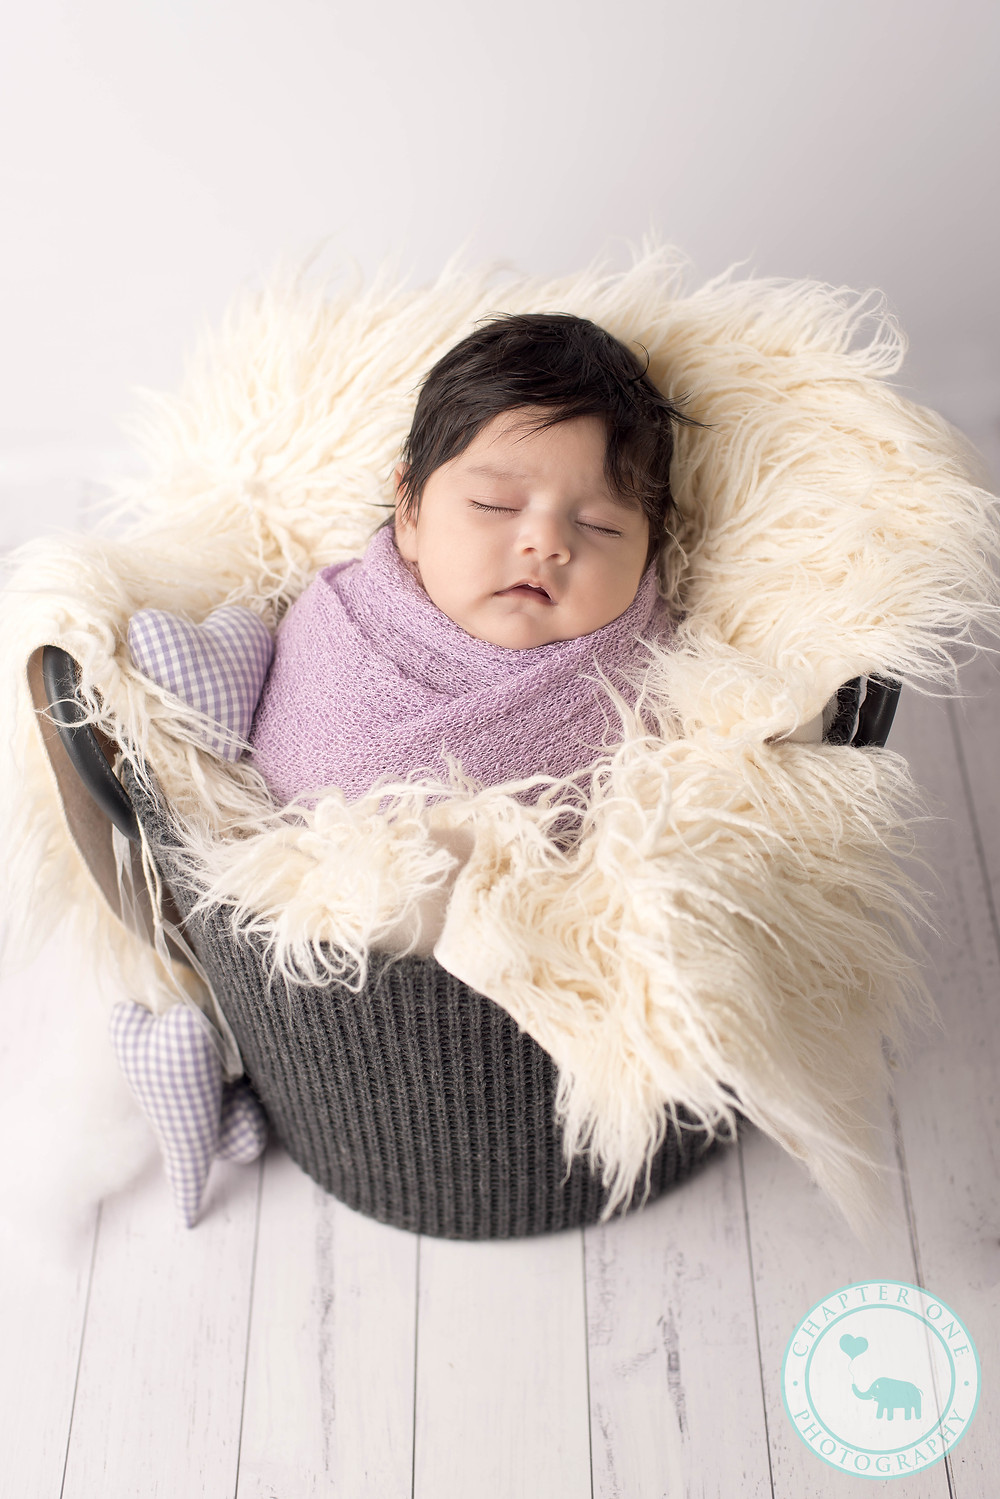 Newborn Baby Girl in purple